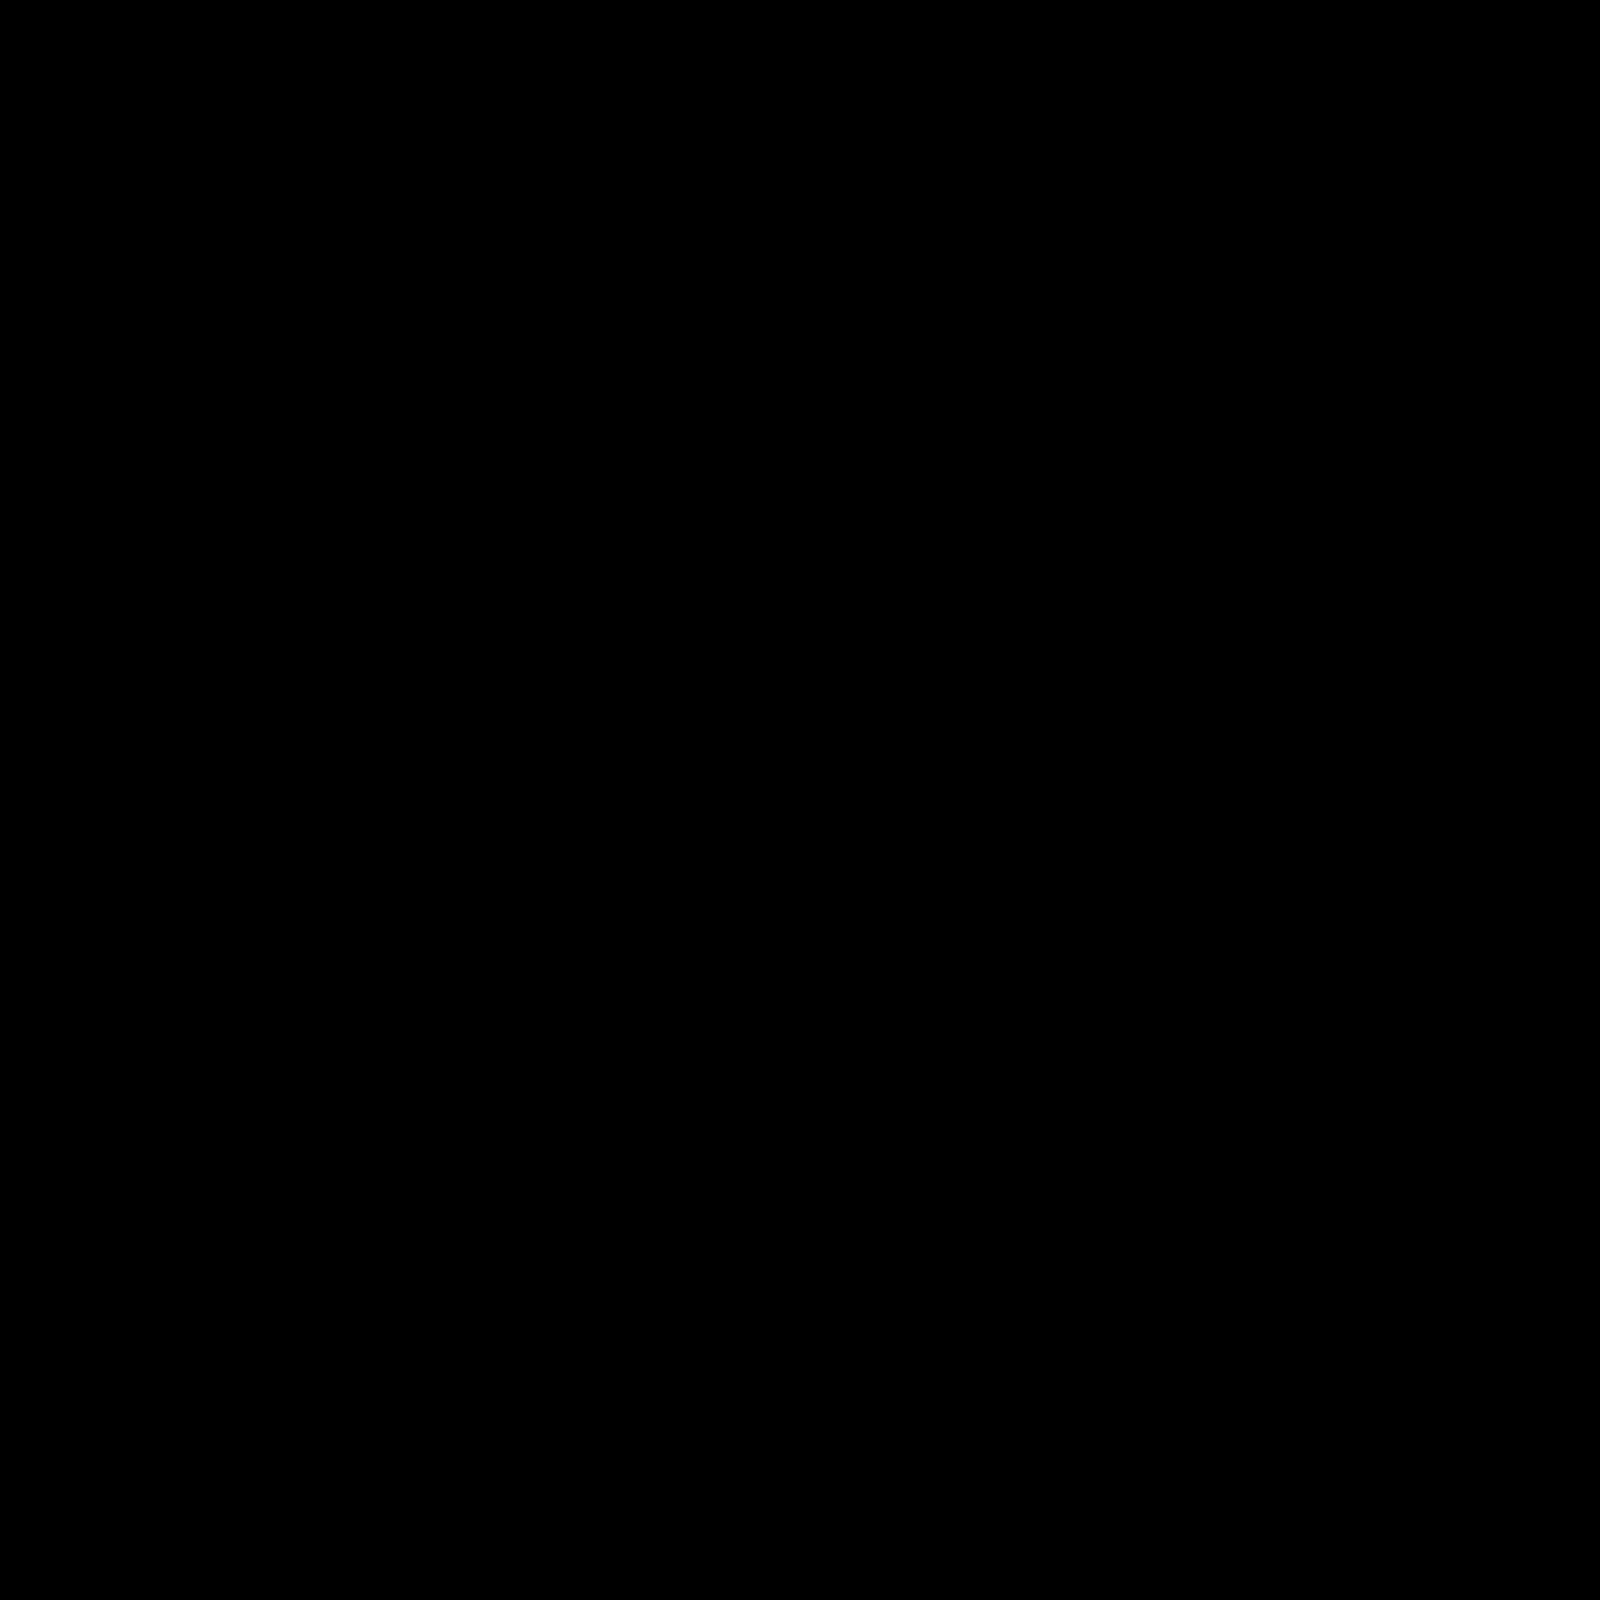 Astrolabe Filled icon